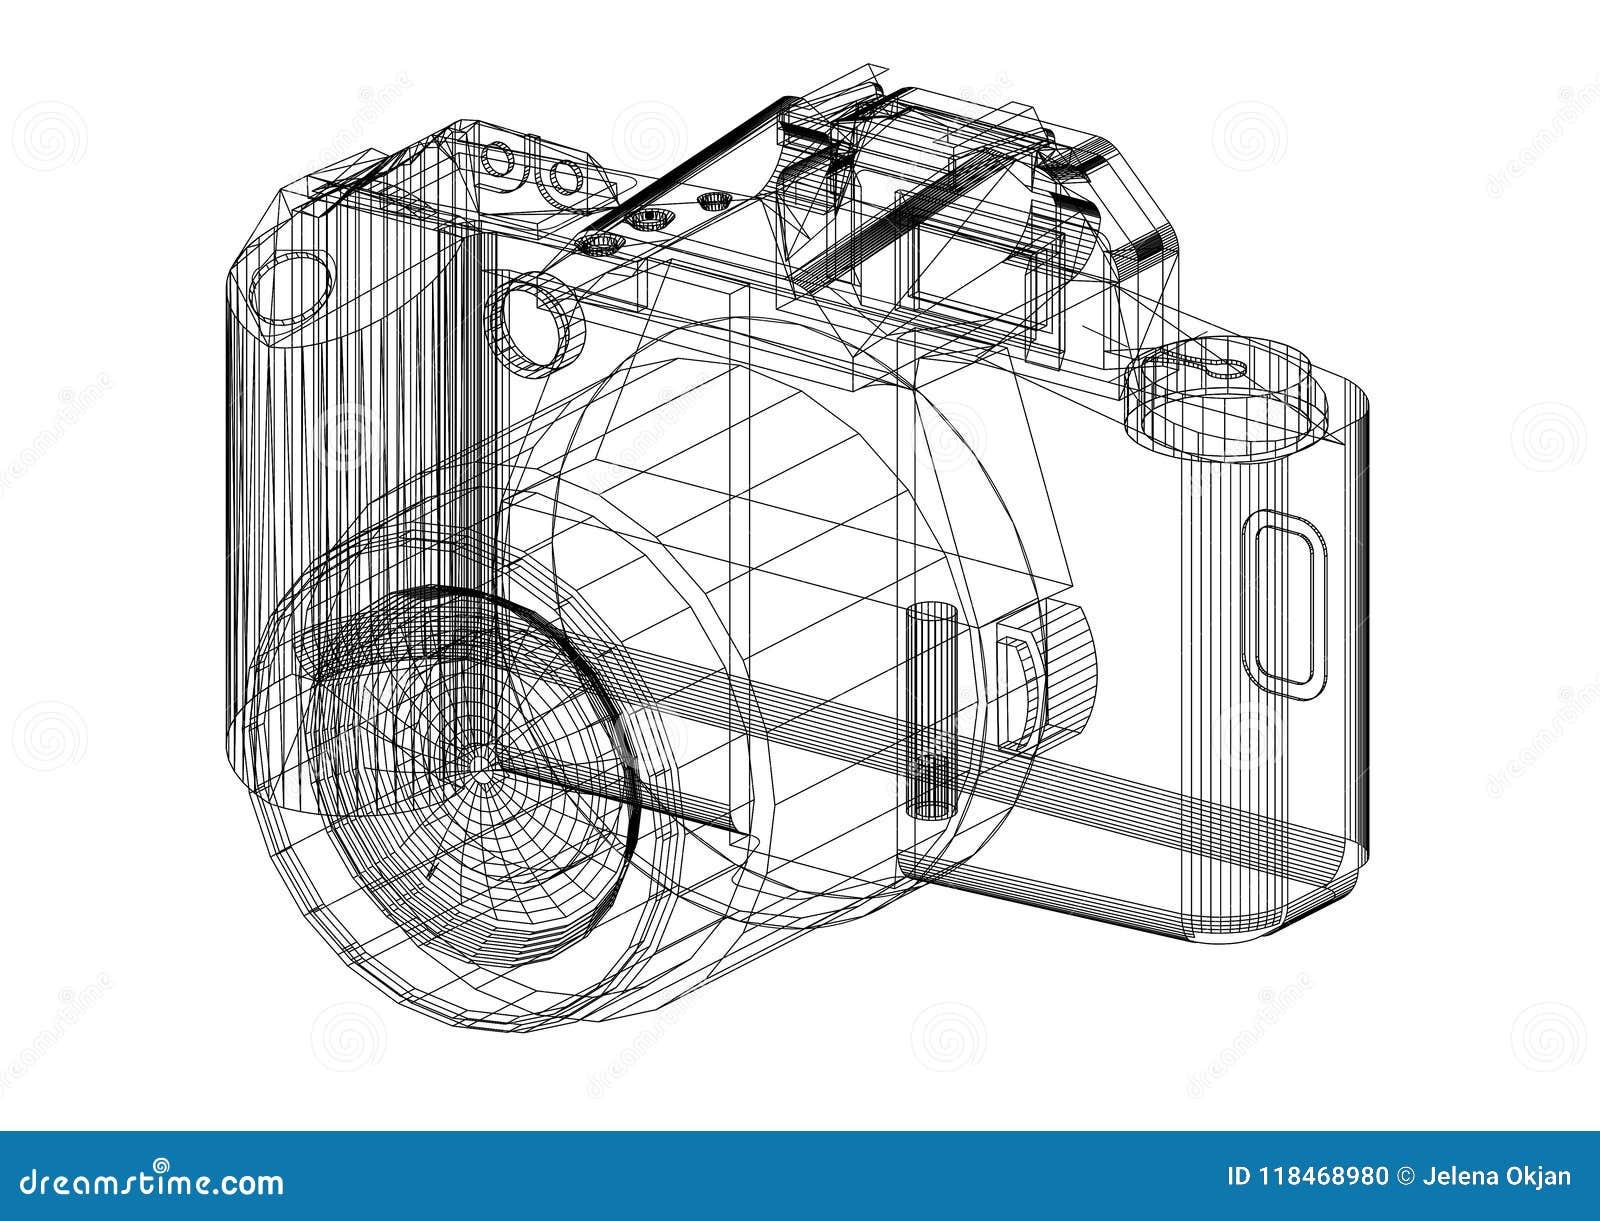 Digital camera sketch drawing stock images 124 photos malvernweather Images